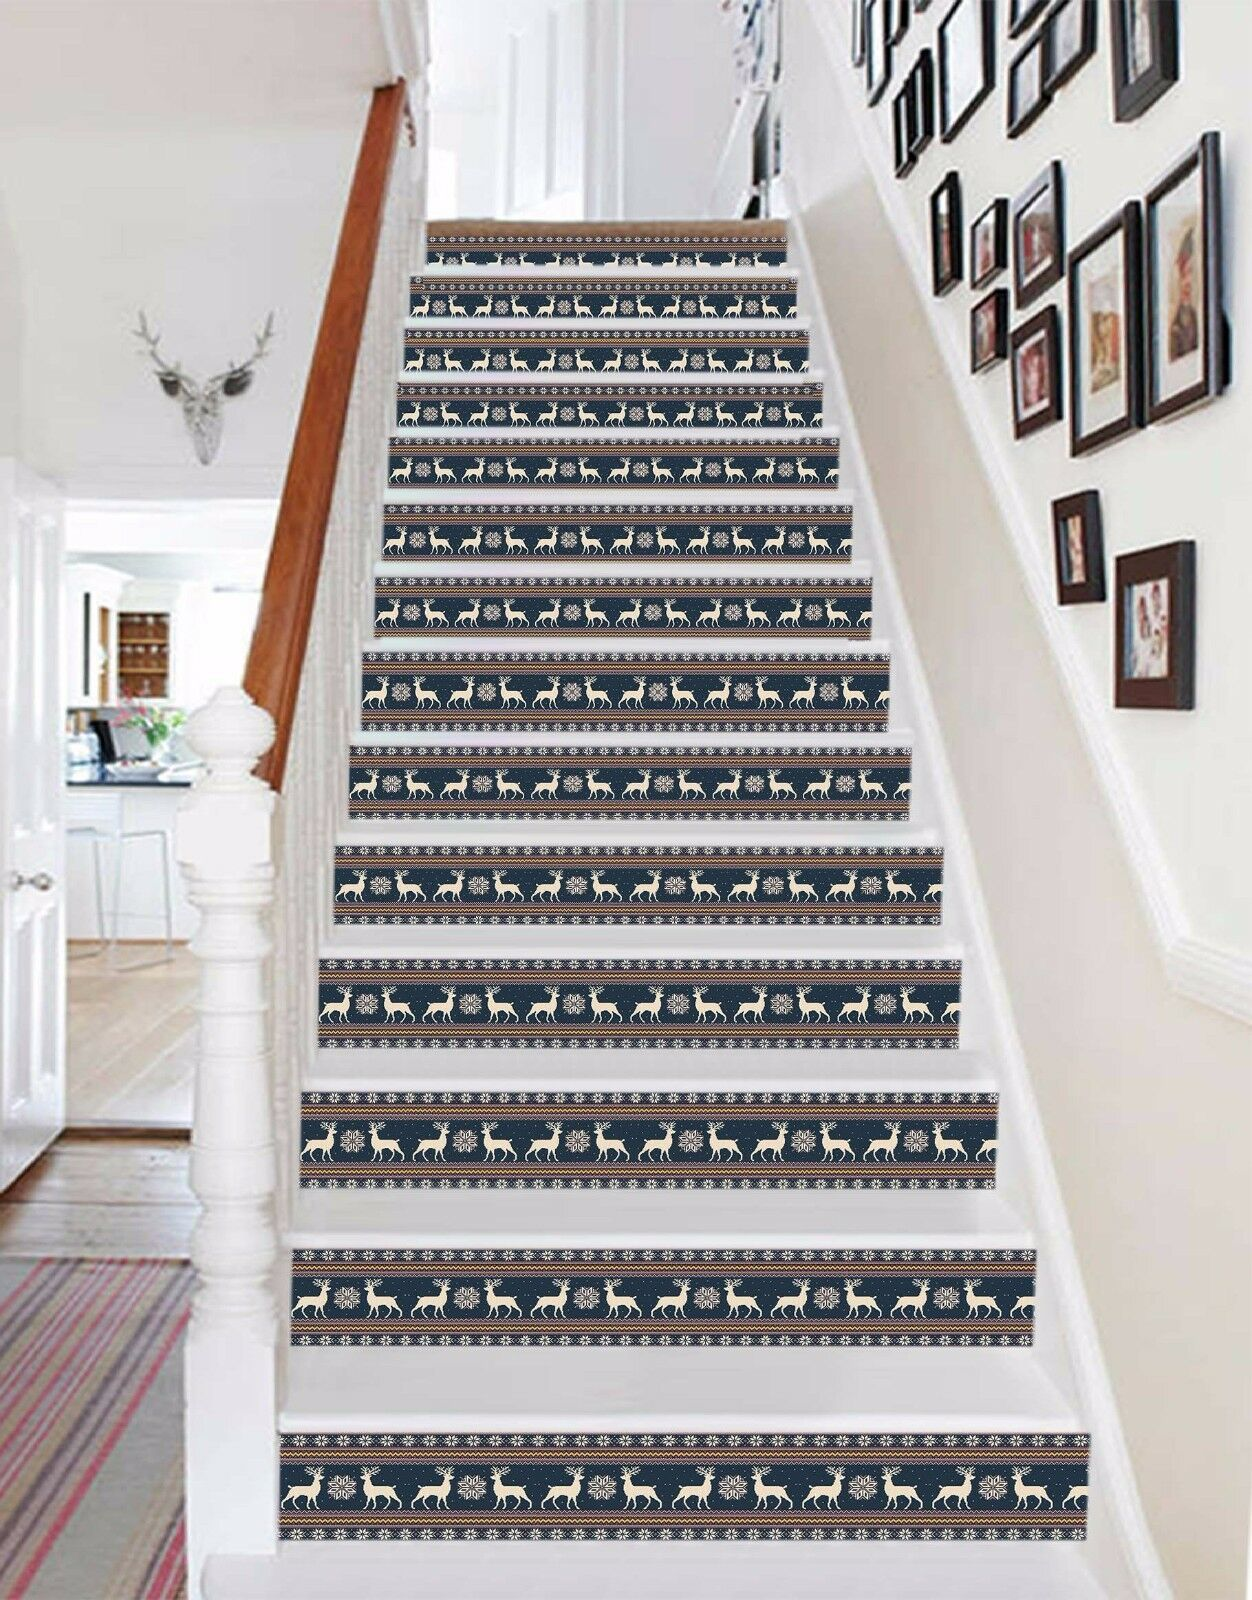 3D Hirsch Muster 31 Stair Risers Dekoration Fototapete Vinyl Aufkleber Tapete DE